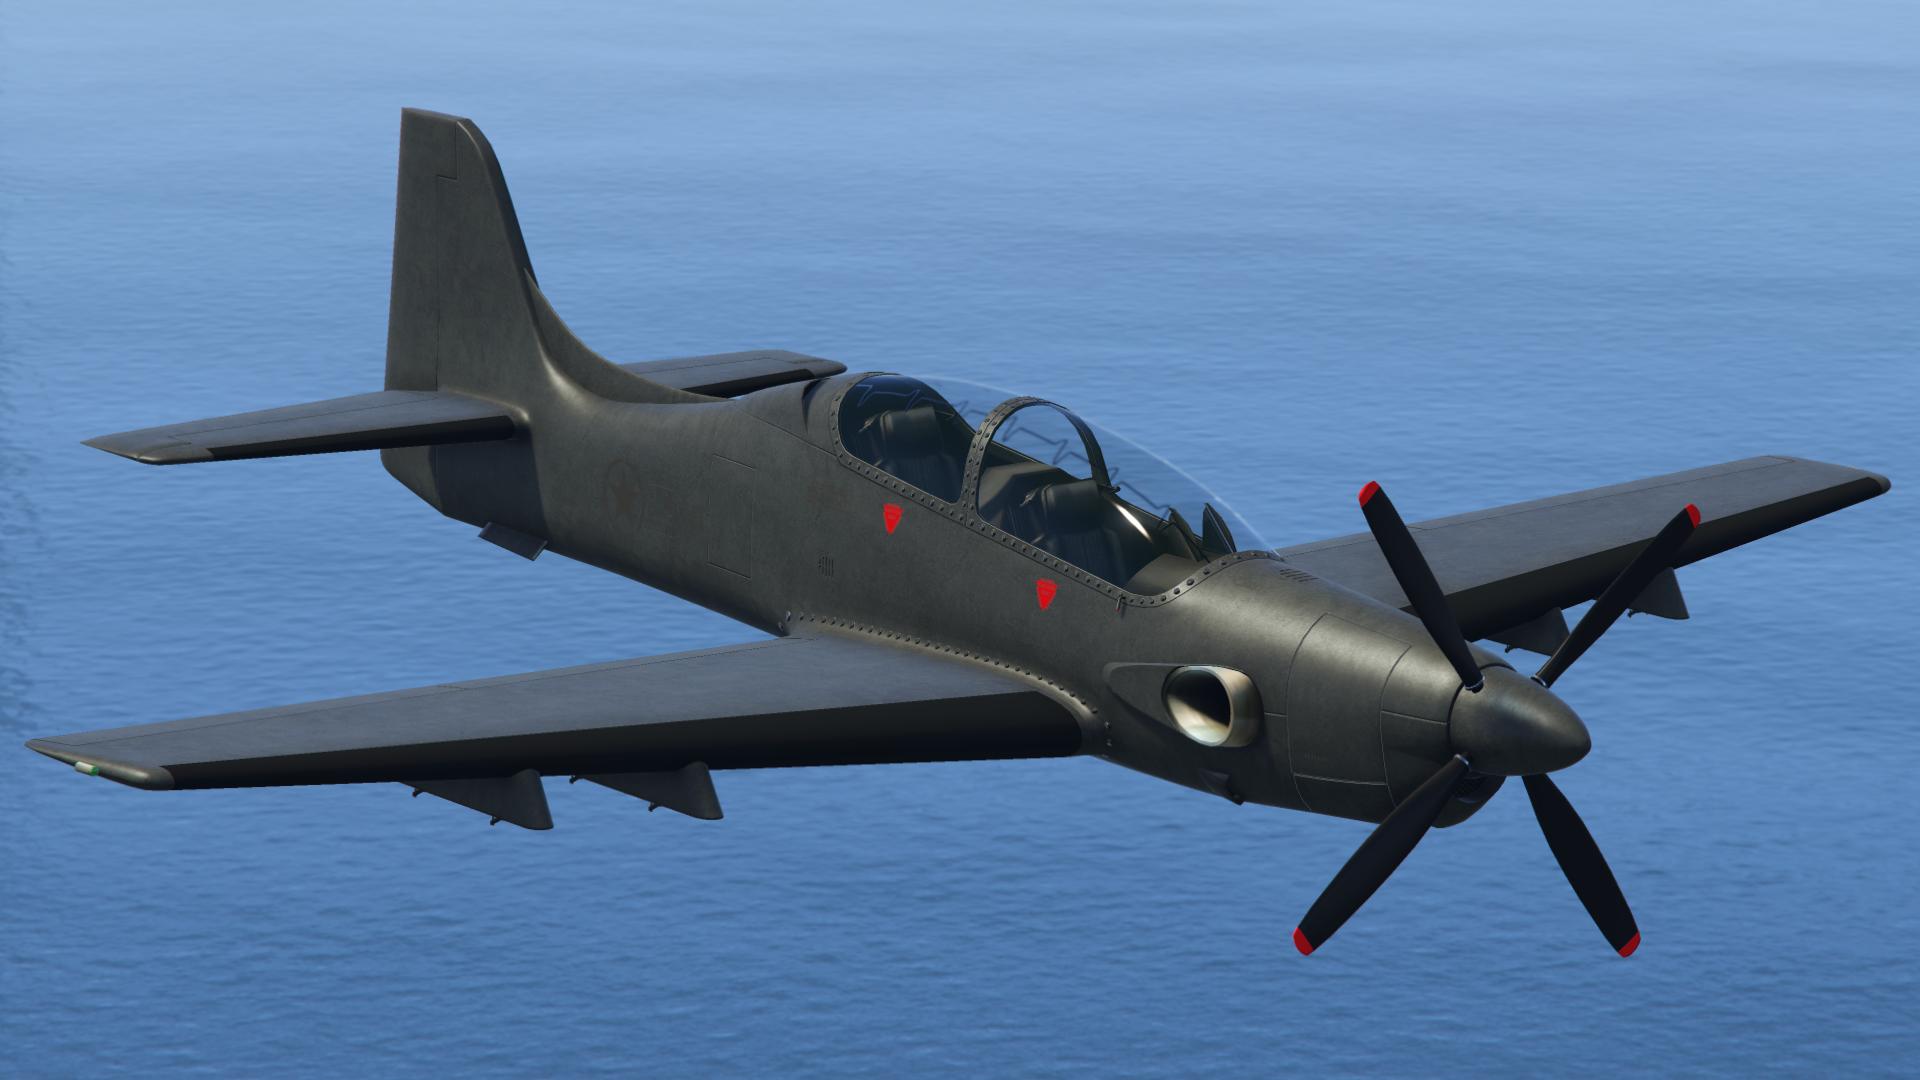 gta v plane customization list